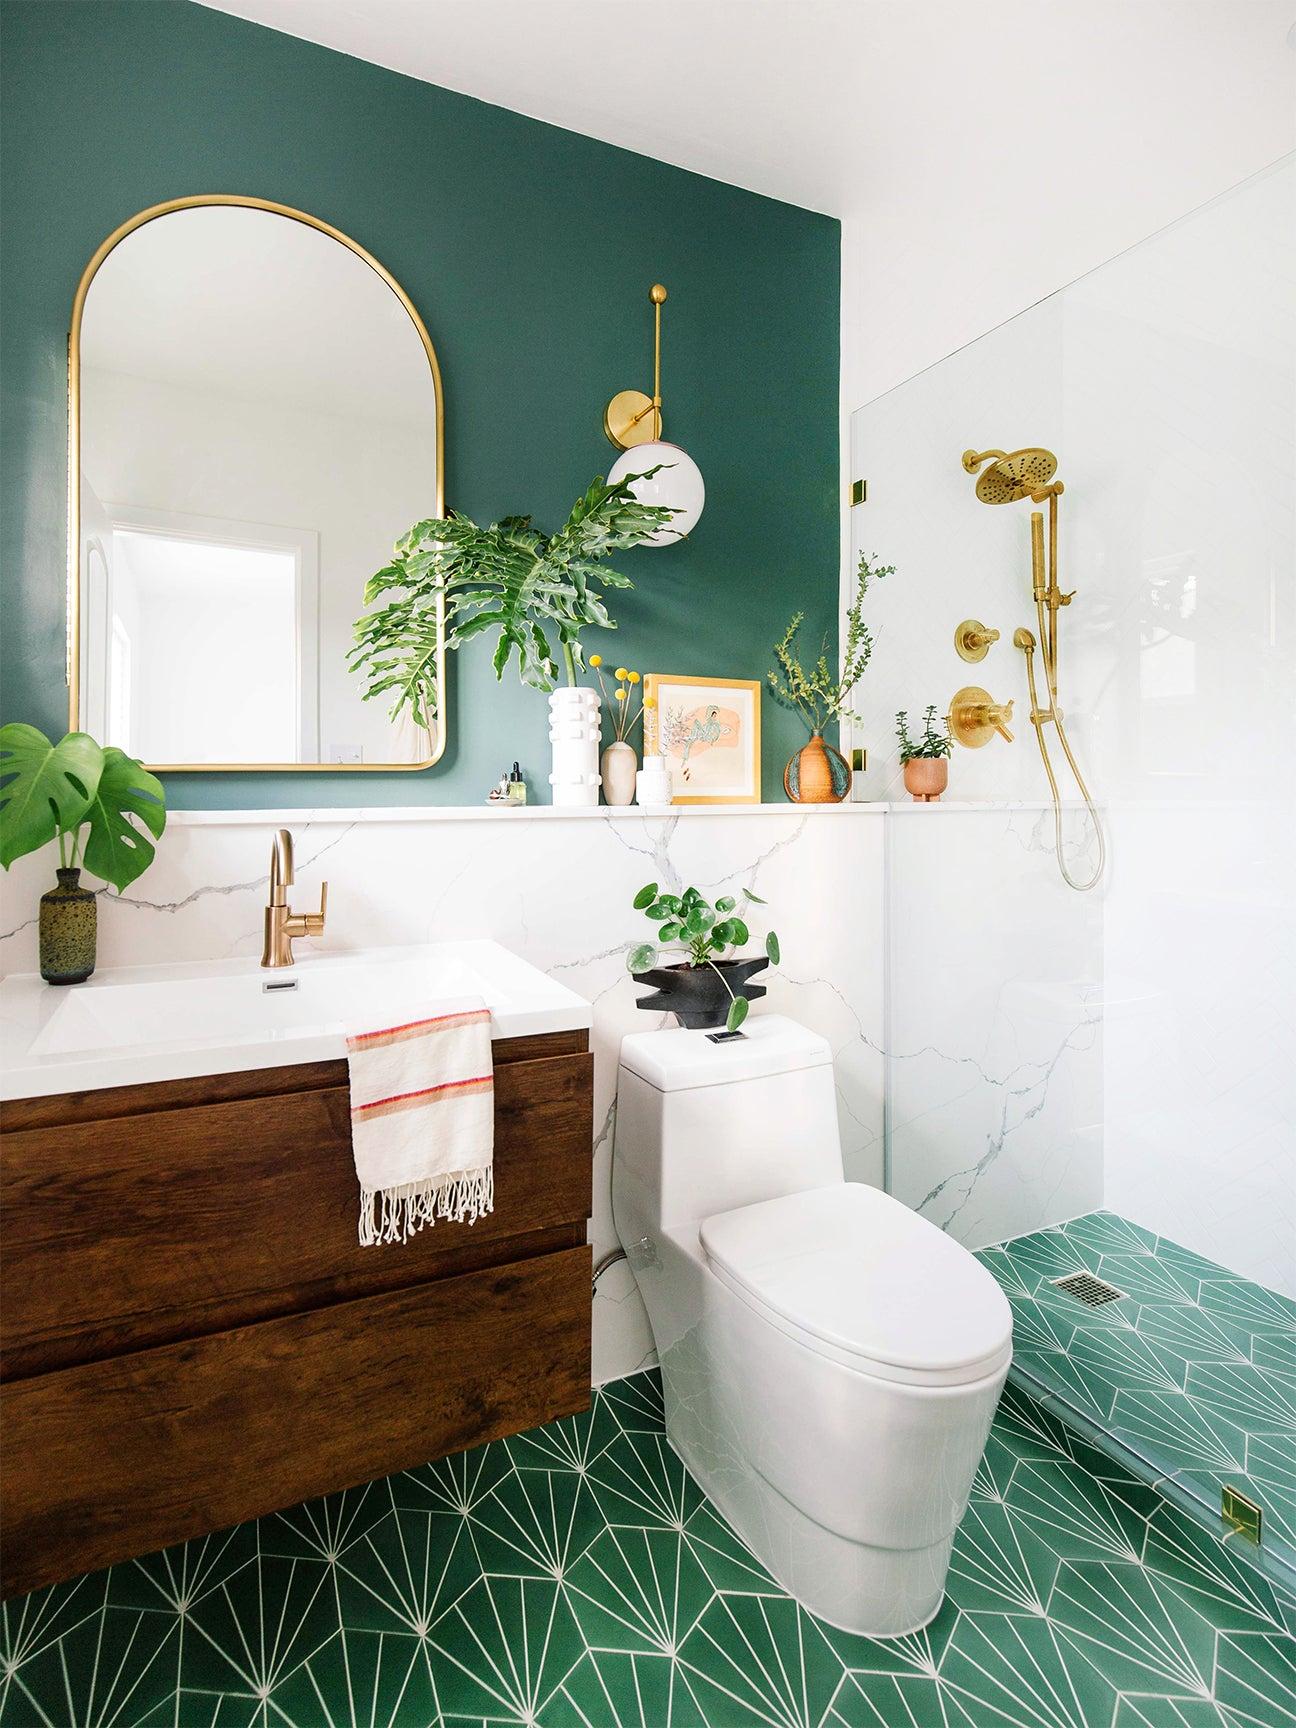 green bathroom with plants